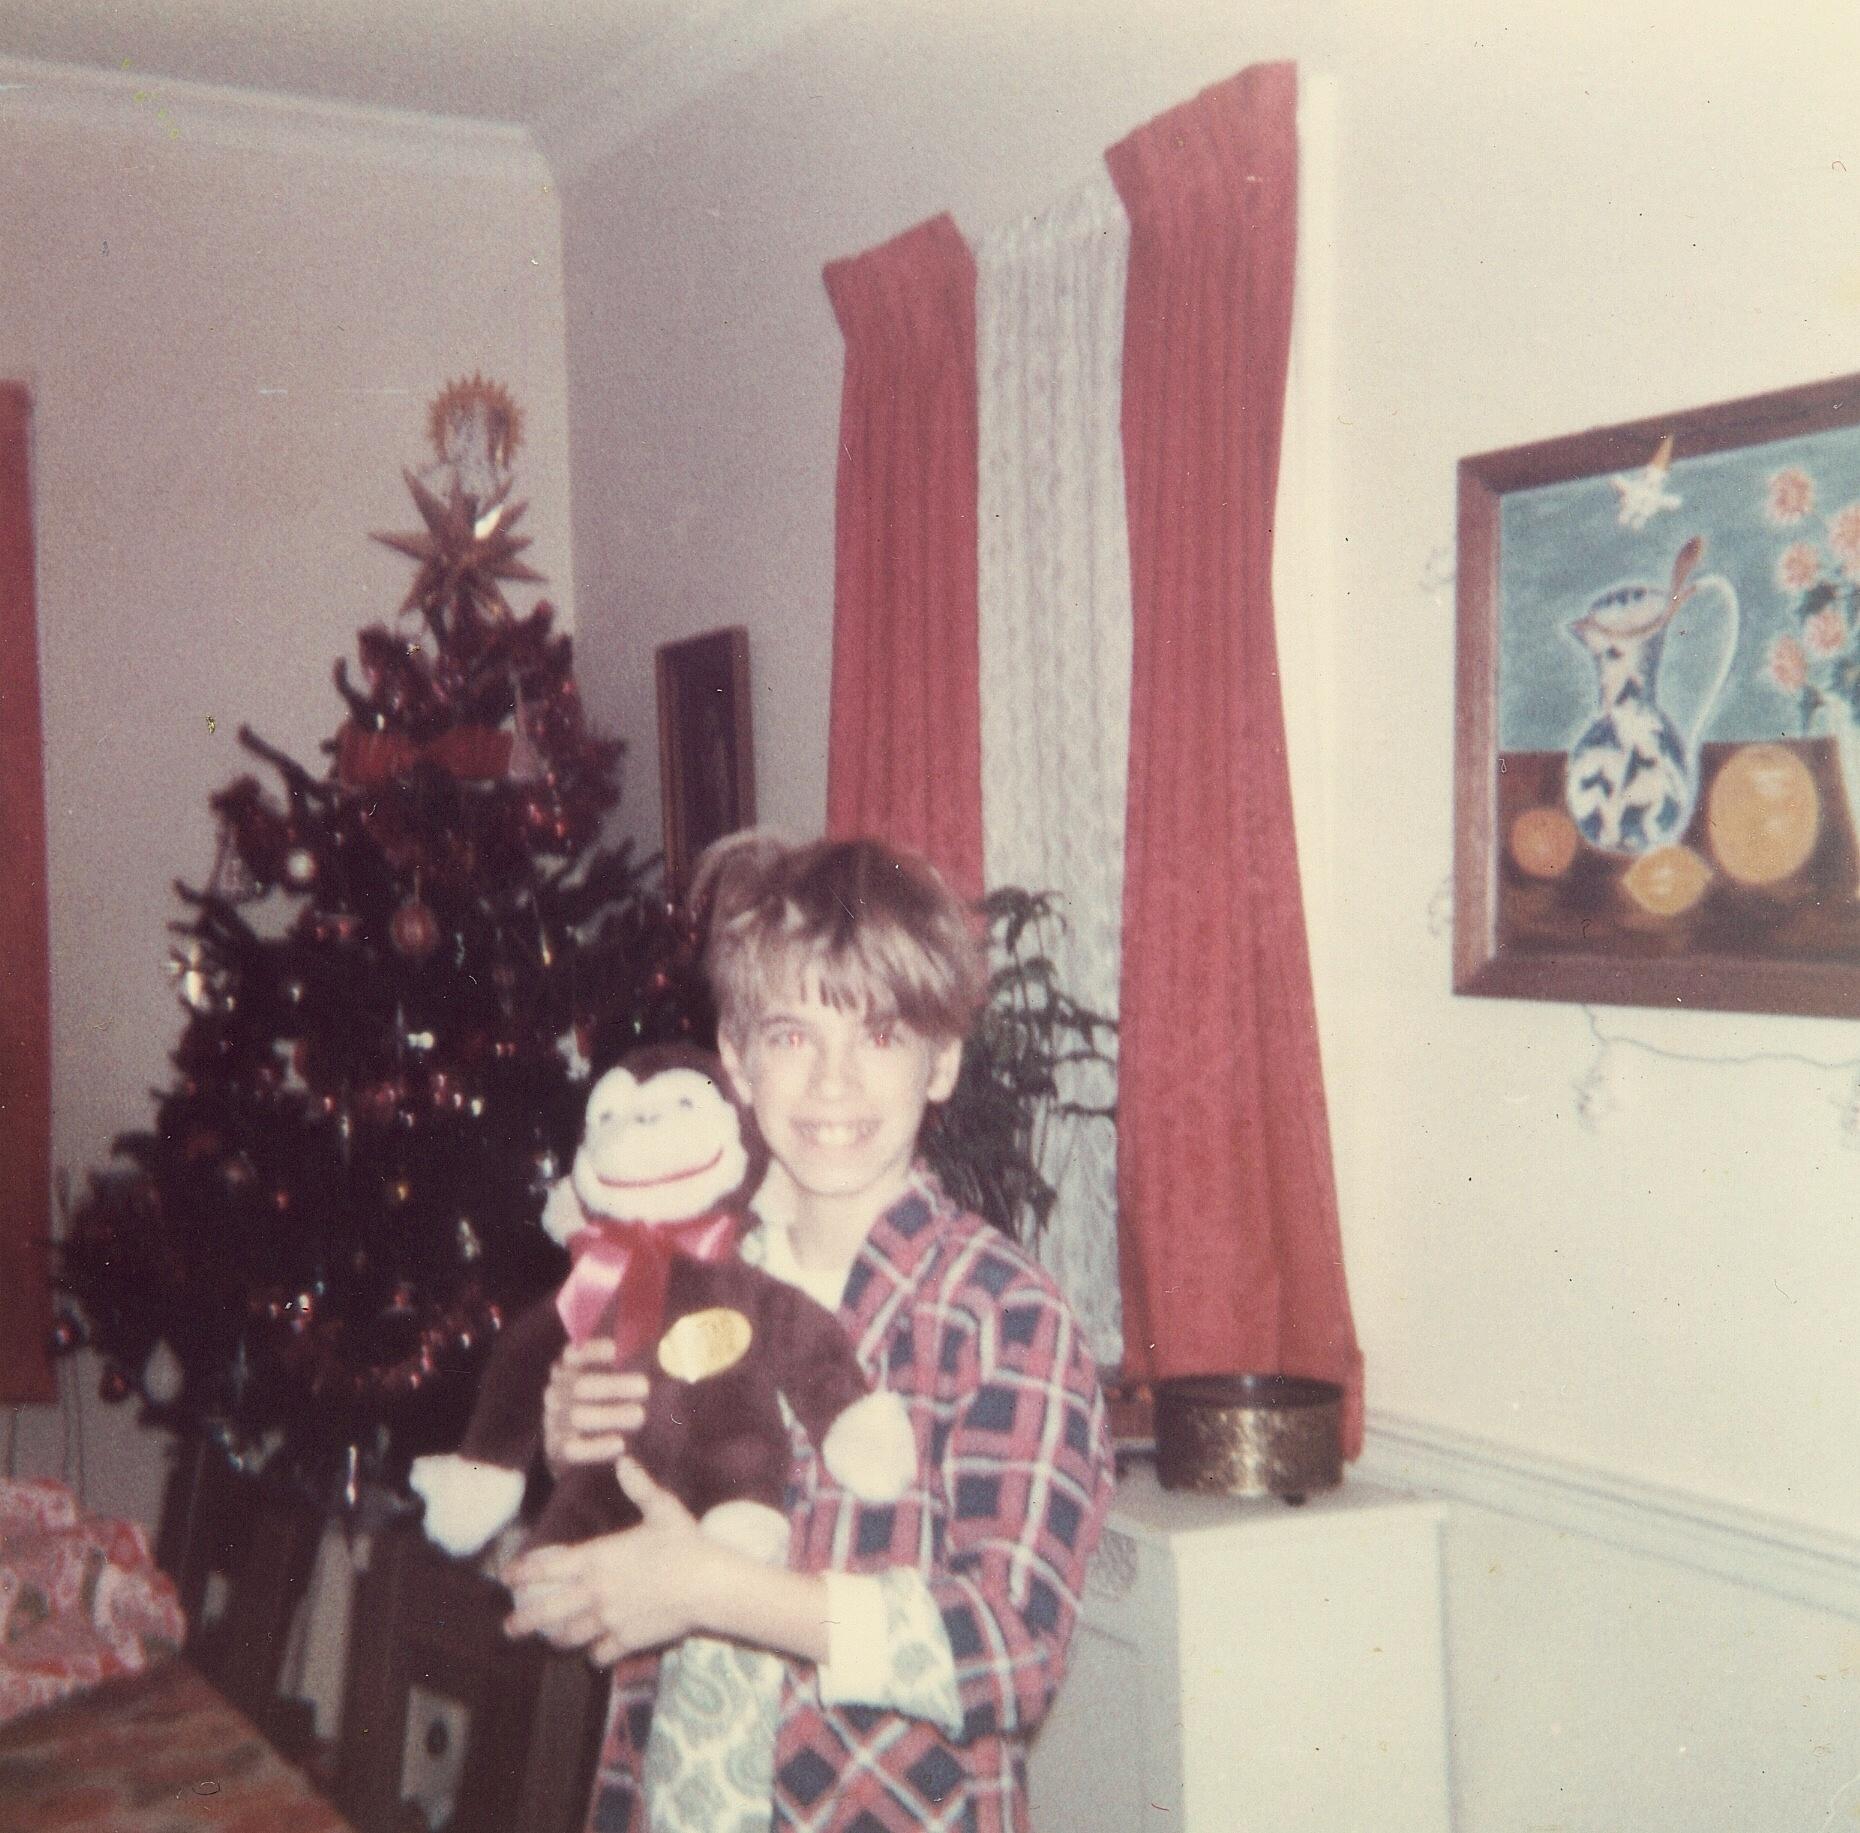 David and his stuffed monkey.